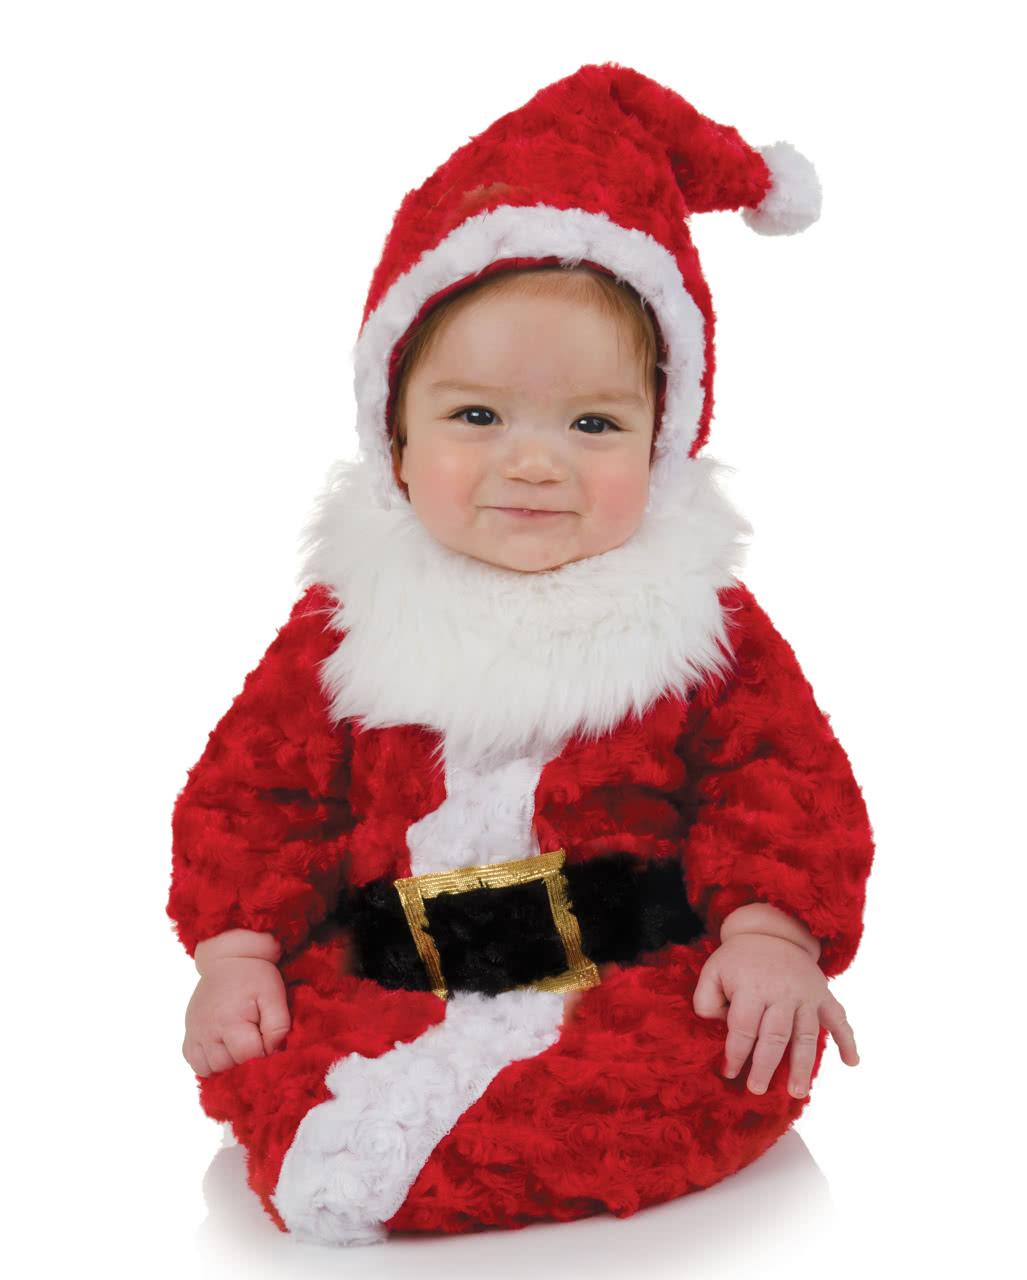 weihnachtsmann babysack kost m pl sch strampelsack mit. Black Bedroom Furniture Sets. Home Design Ideas